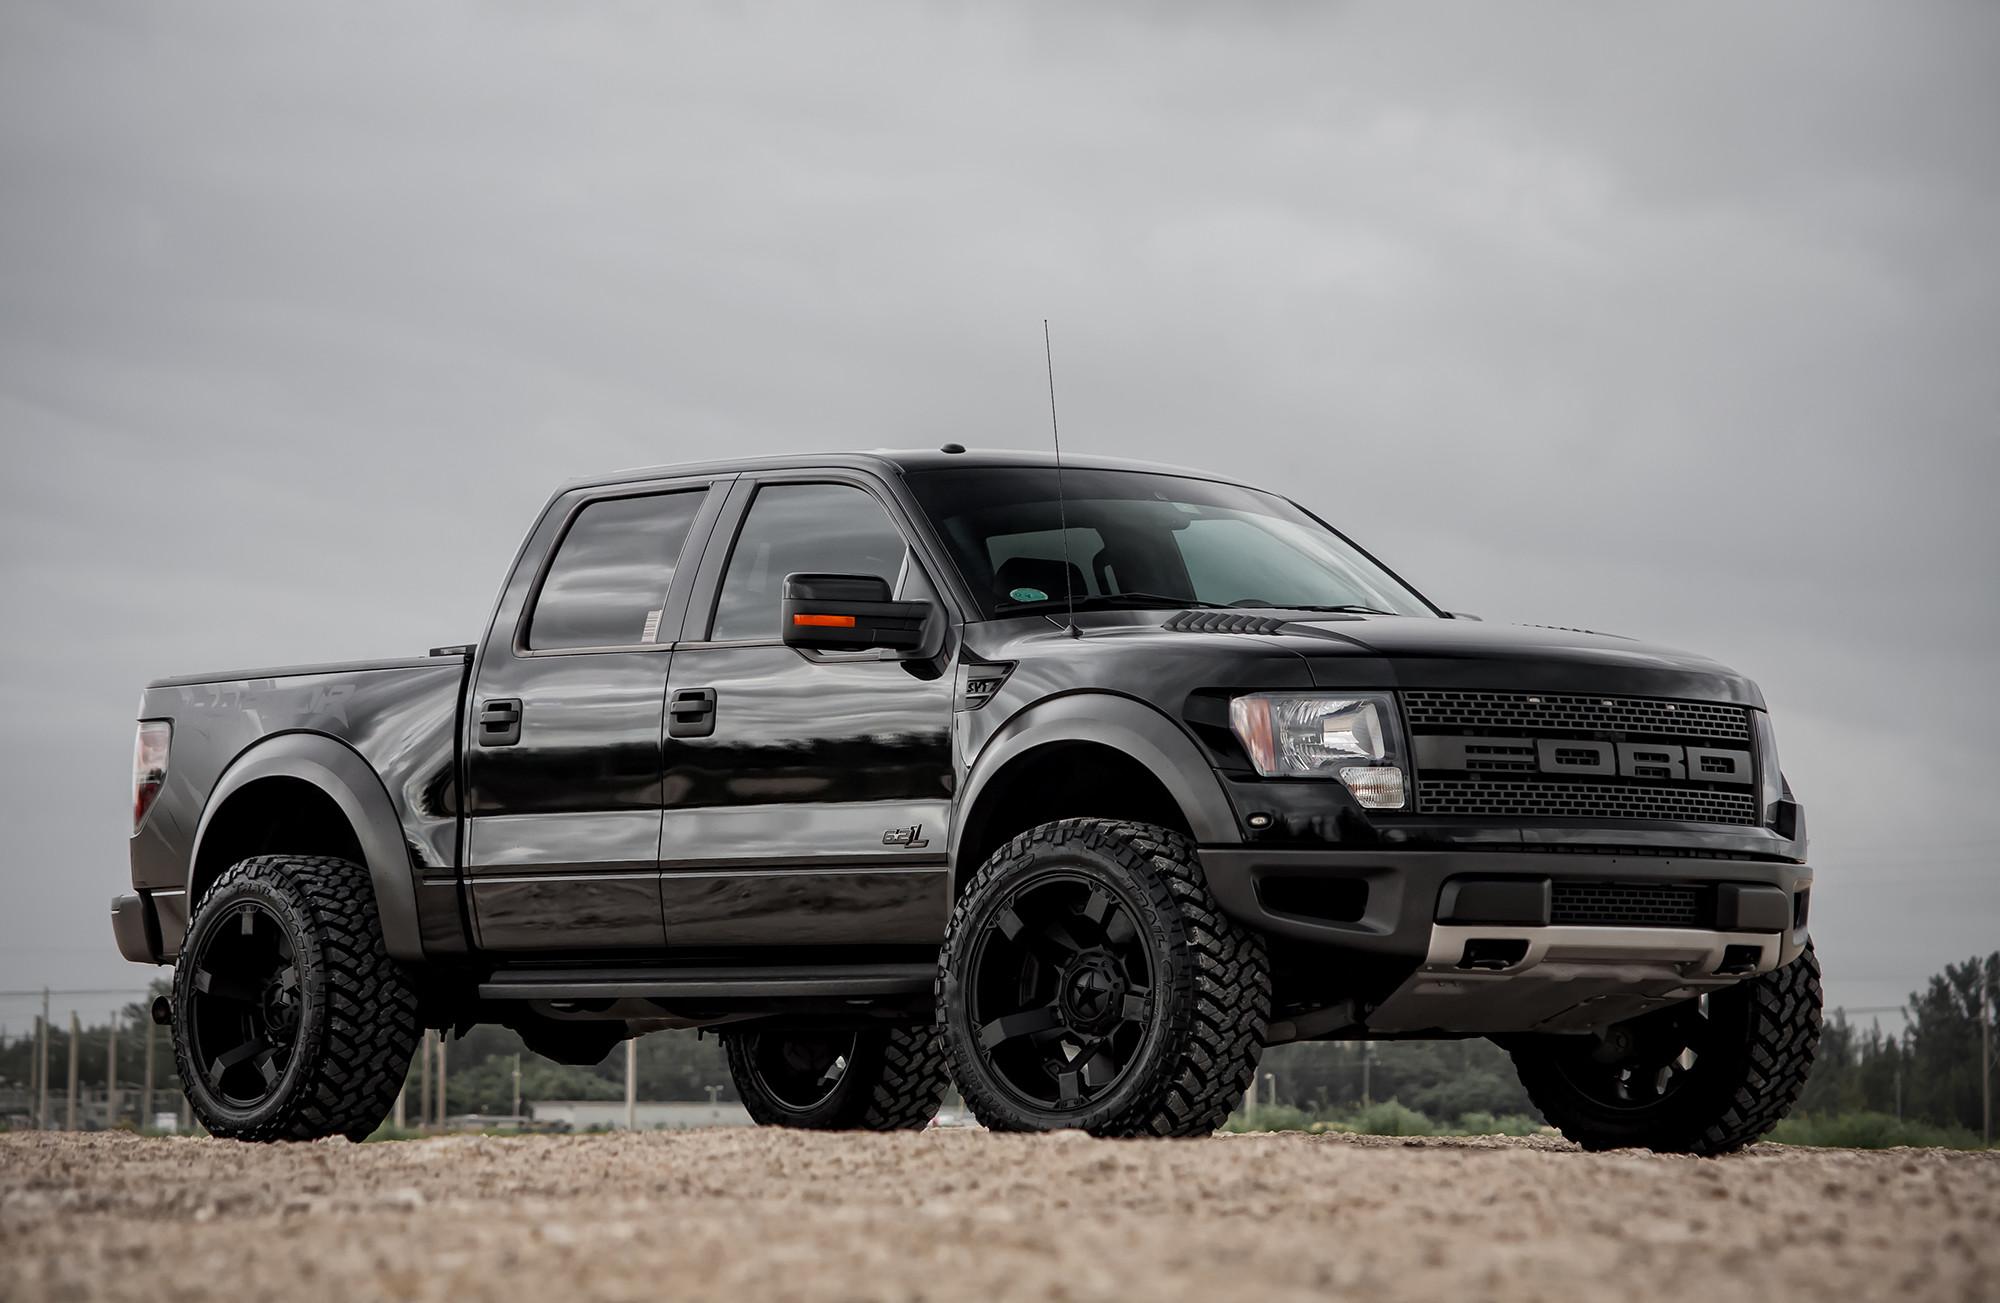 Best 25+ Ford f150 raptor 2015 ideas on Pinterest   Ford raptor 2015, Ford  raptor for sale and 2013 ford raptor